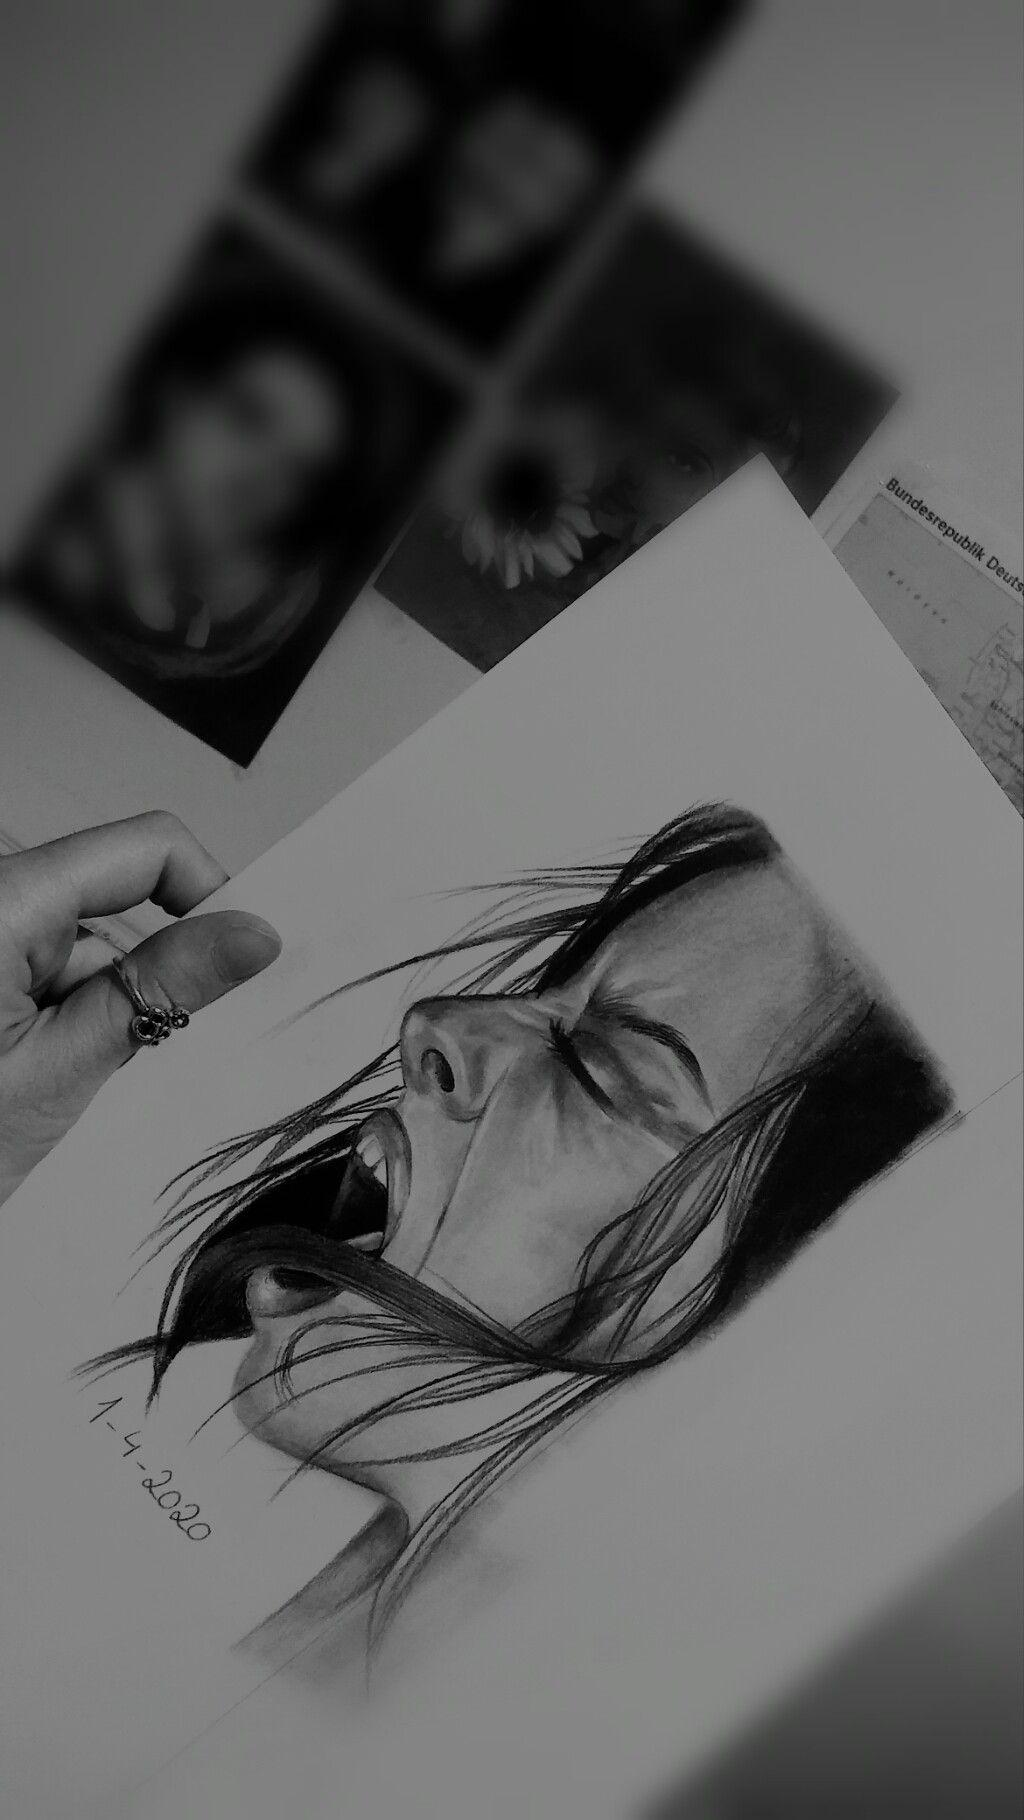 Girl Screams Pencil Art Drawings Screaming Drawing Cool Art Drawings